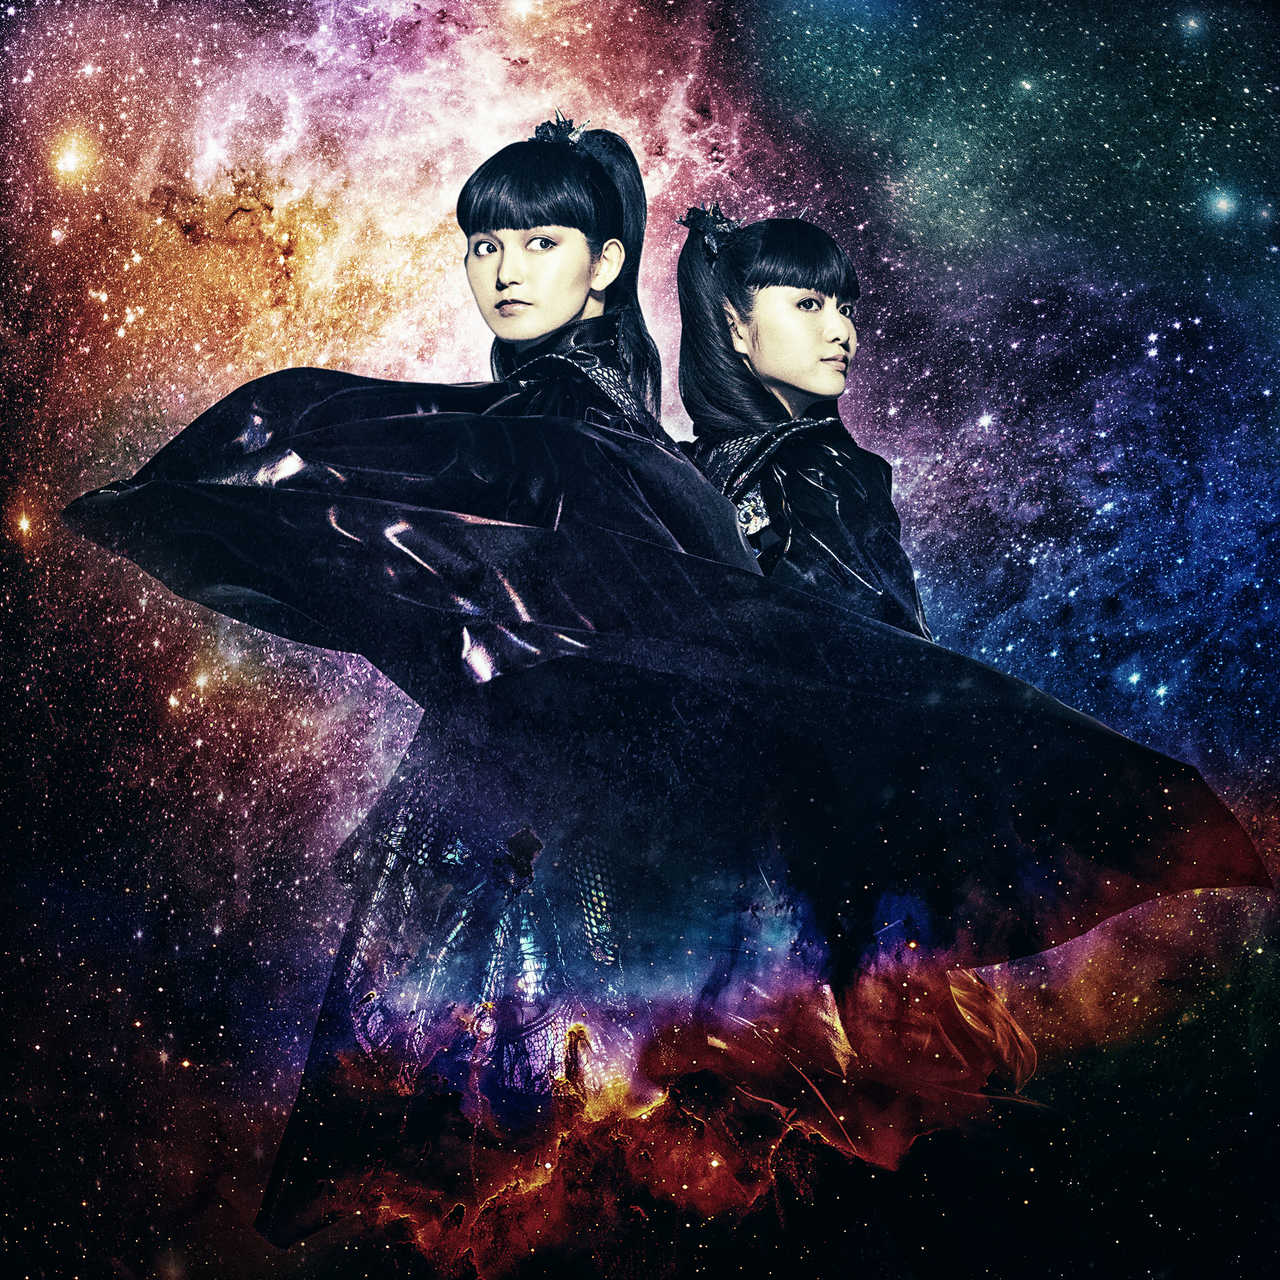 BABYMETAL、最新アルバムを再現した2DAYSライブ映像作品のトレーラーを公開!